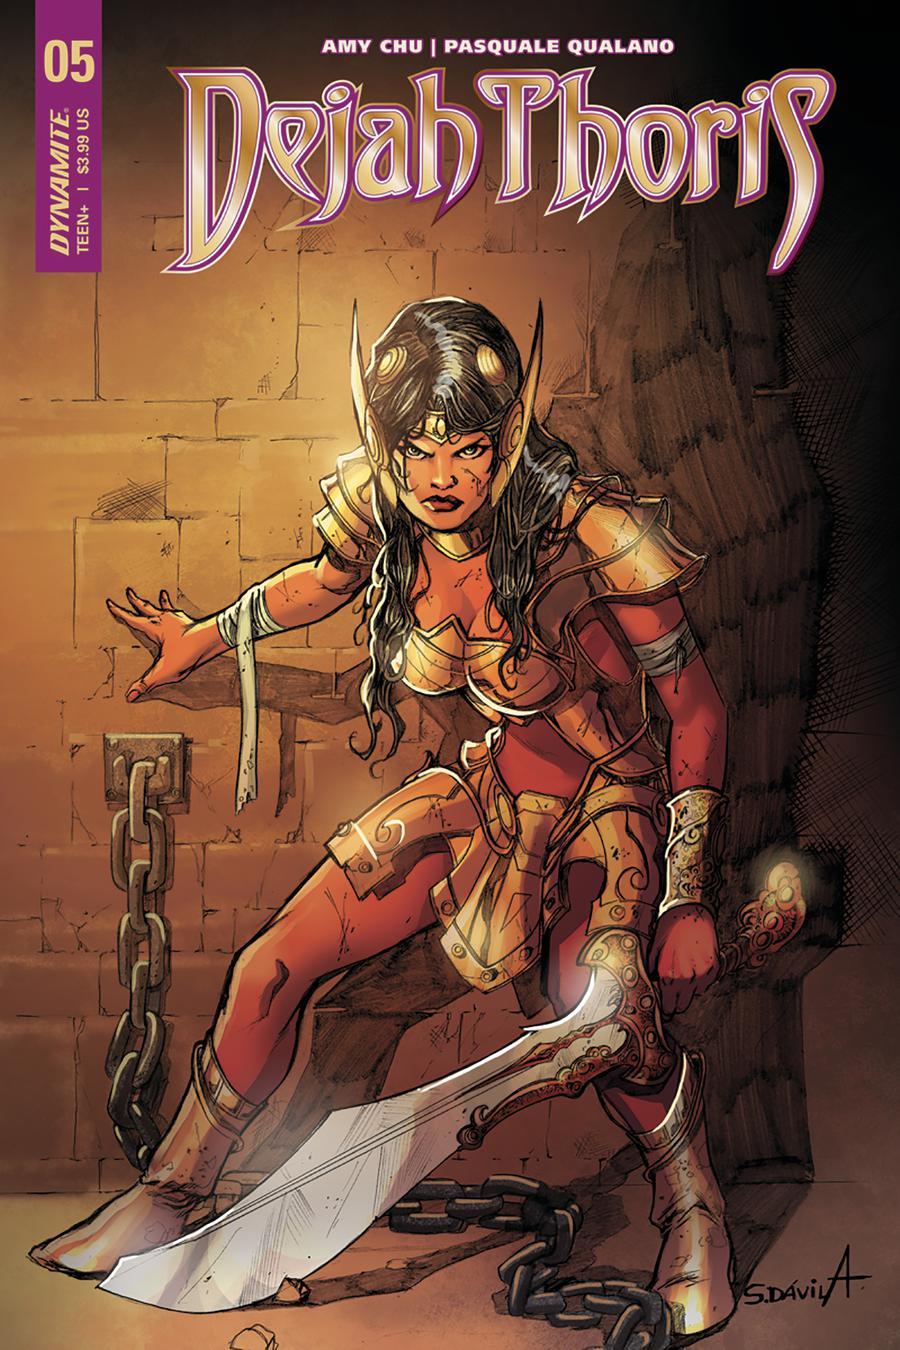 Dejah Thoris Vol 2 #5 Cover C Variant Sergio Davila Cover